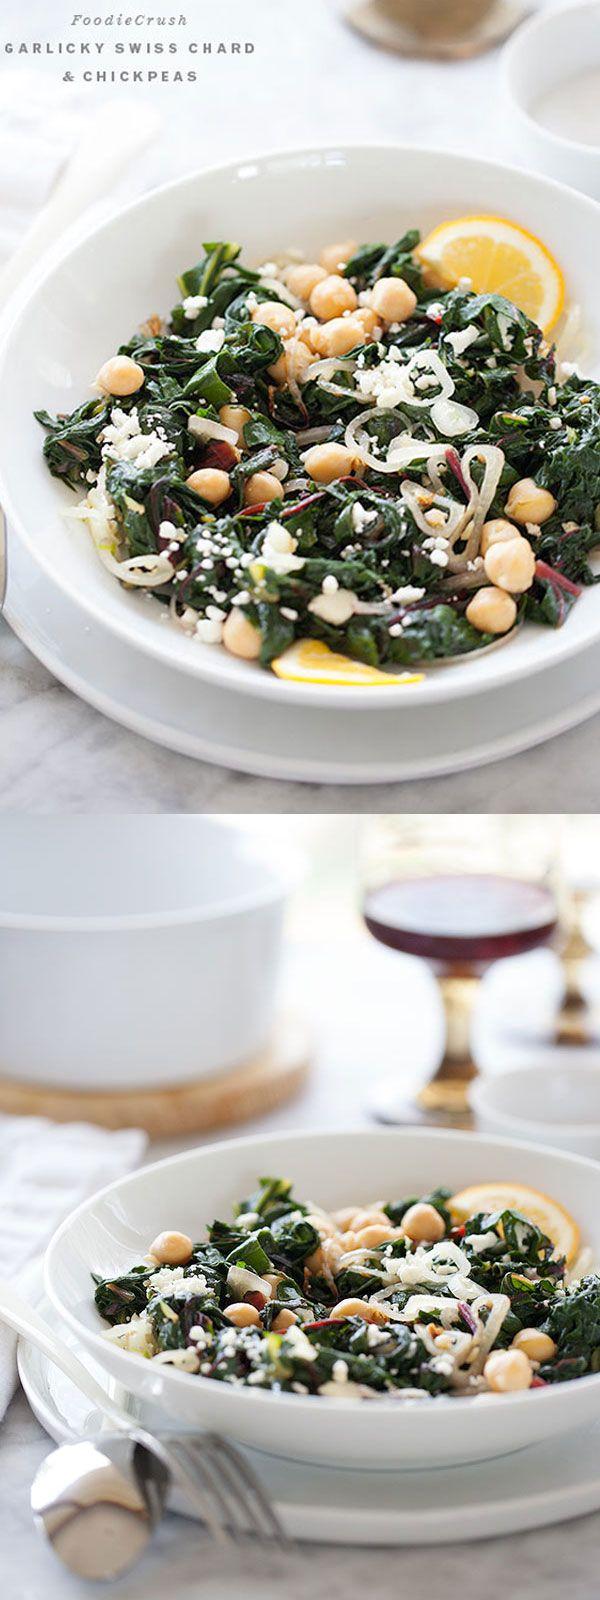 Garlicky Swiss Chard and Chickpeas | foodiecrush.com